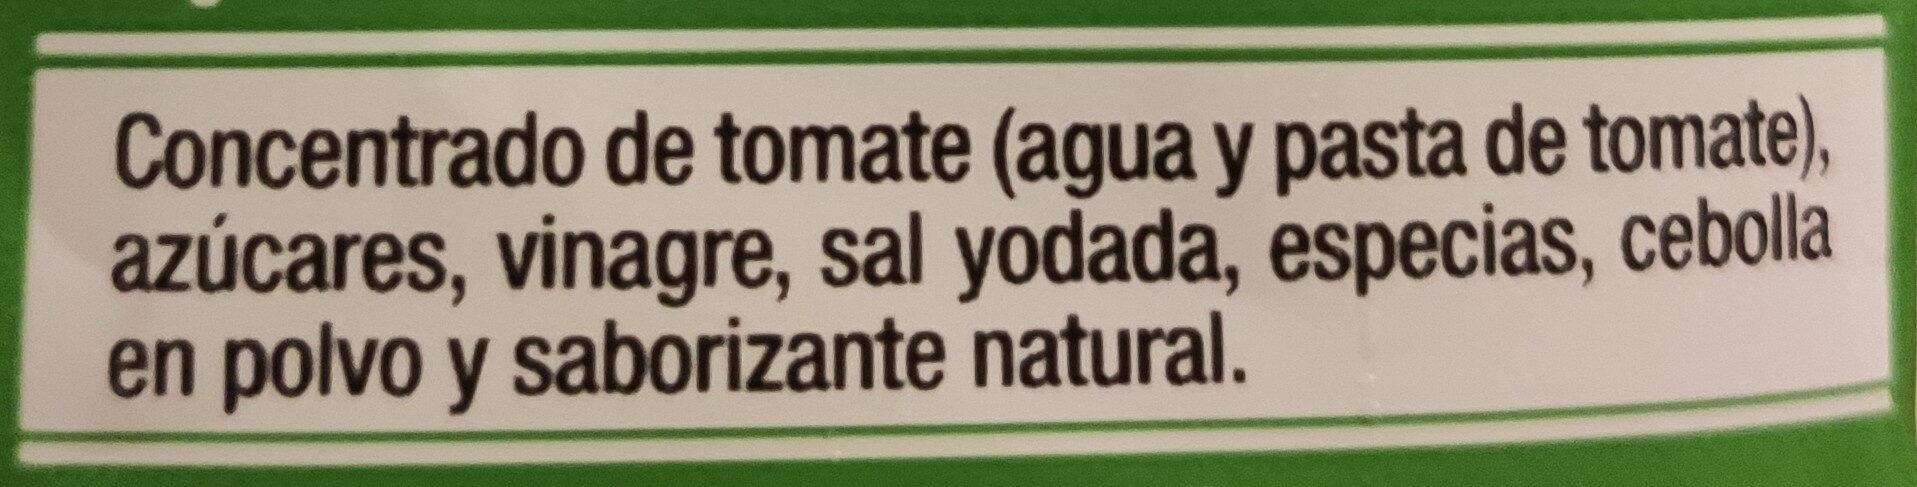 Tomato Ketchup - Ingredients - es